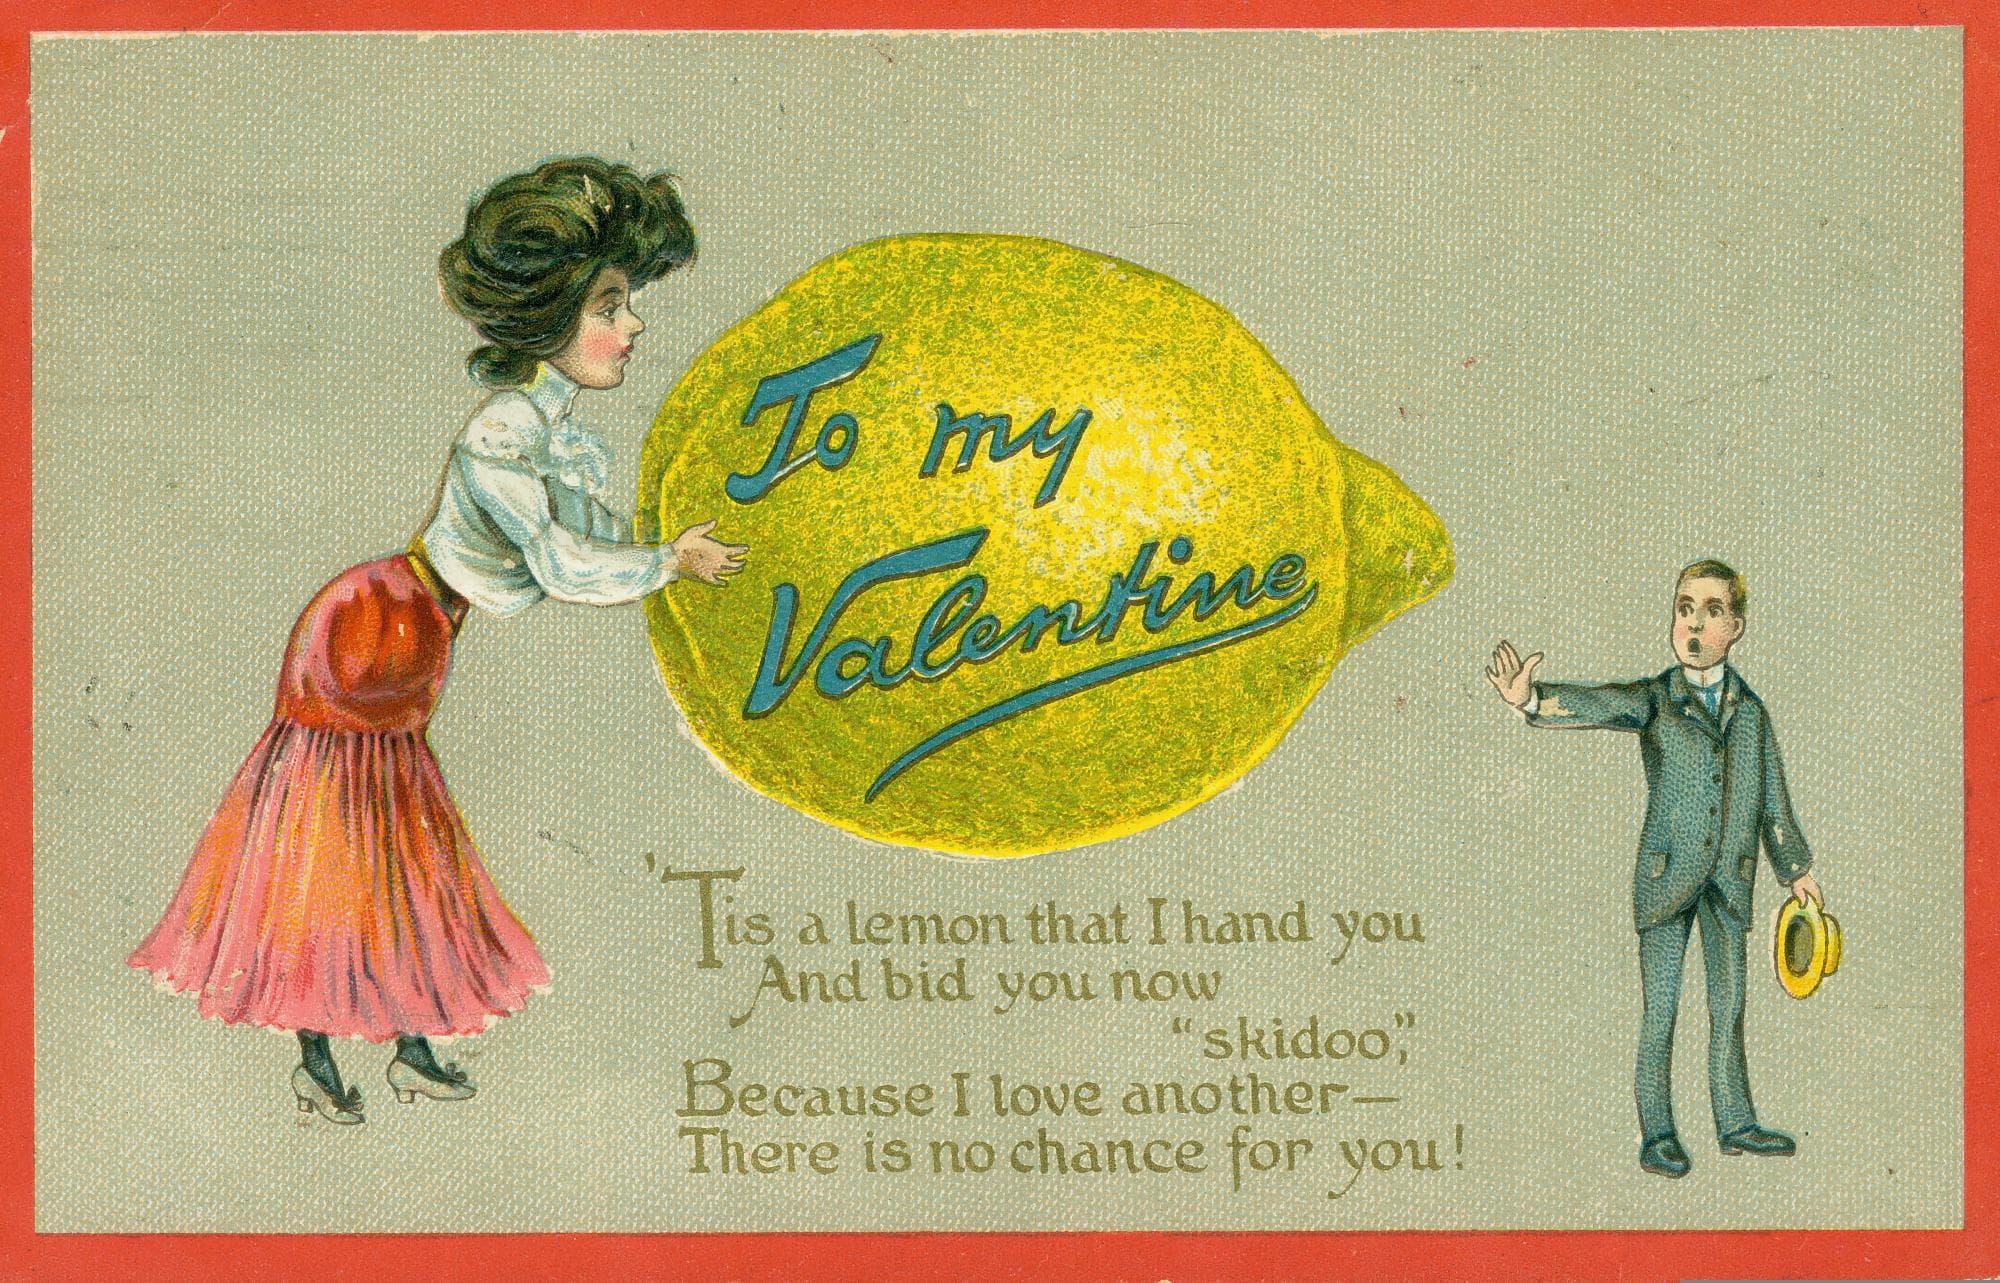 vinegar-valentines-lemon_valentine